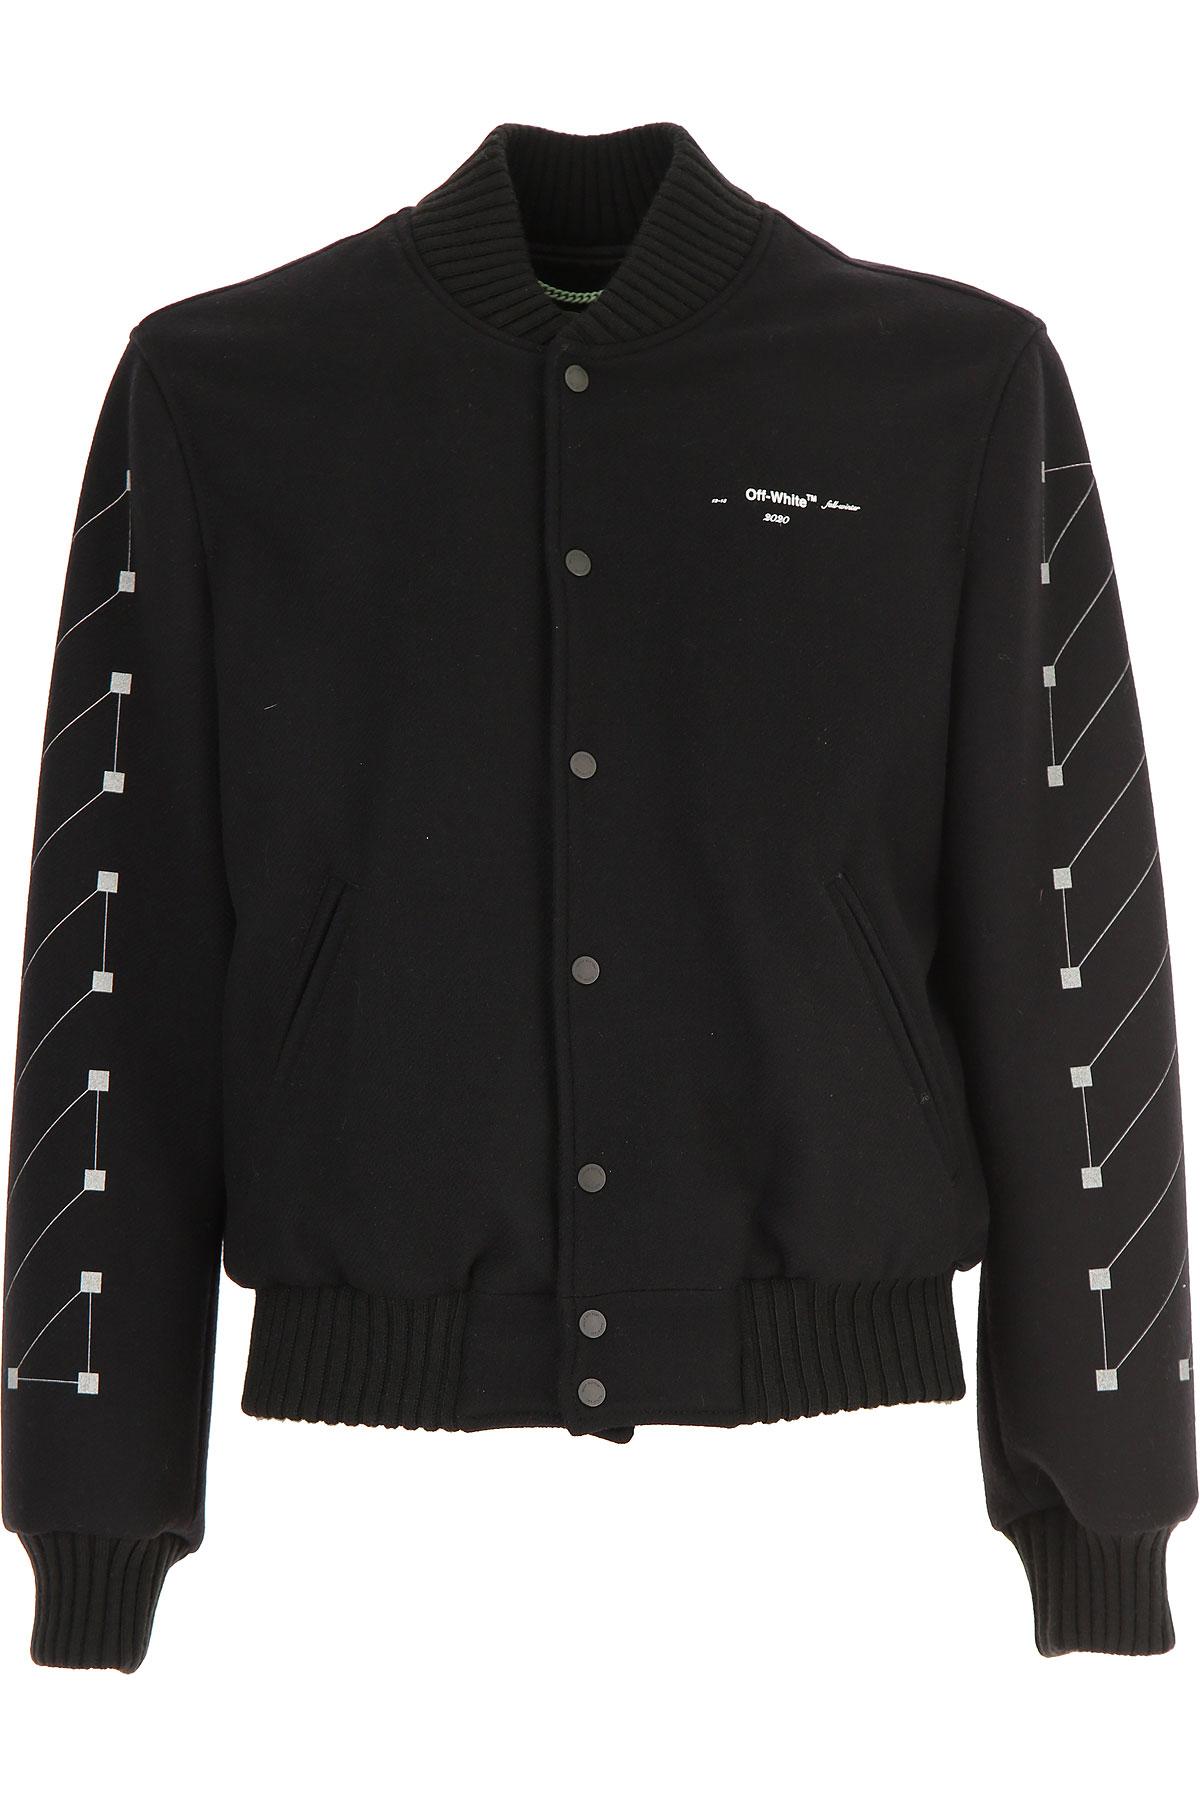 Off-White Virgil Abloh Jacket for Men On Sale, Black, Wool, 2019, L M S XS